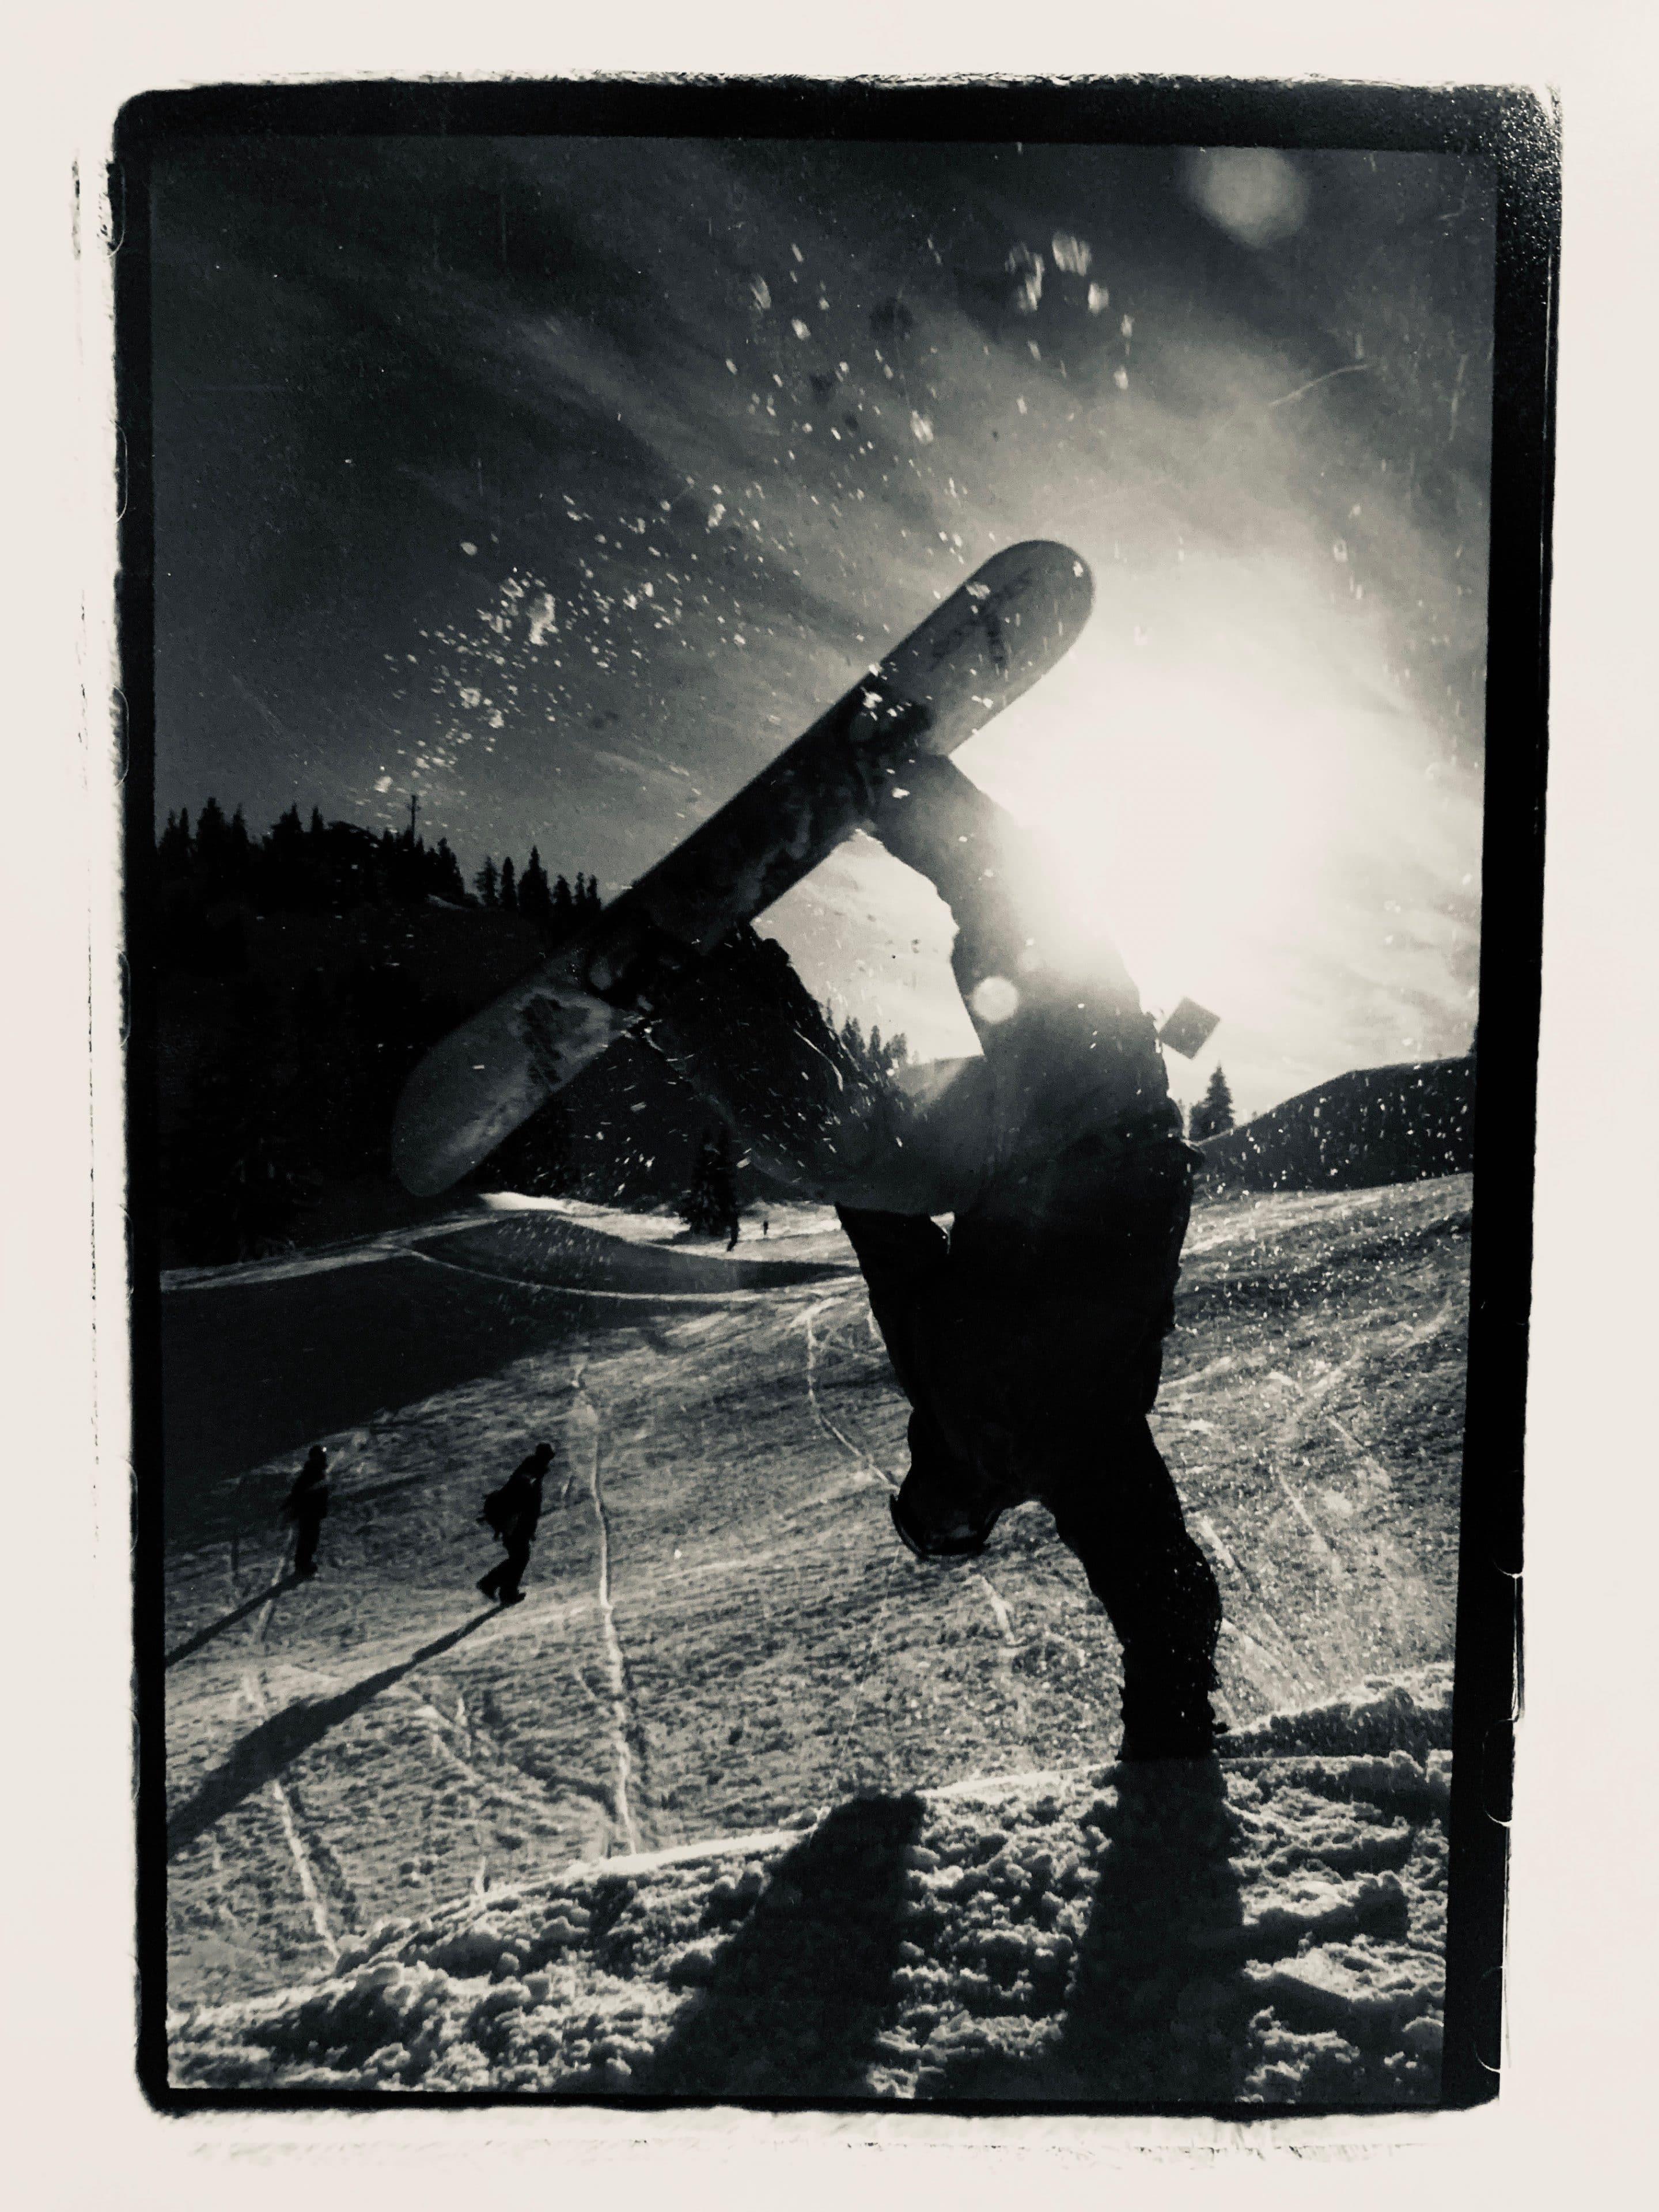 Dr. Iversen does a sick snowboarding trick on a ski slope in Washington.